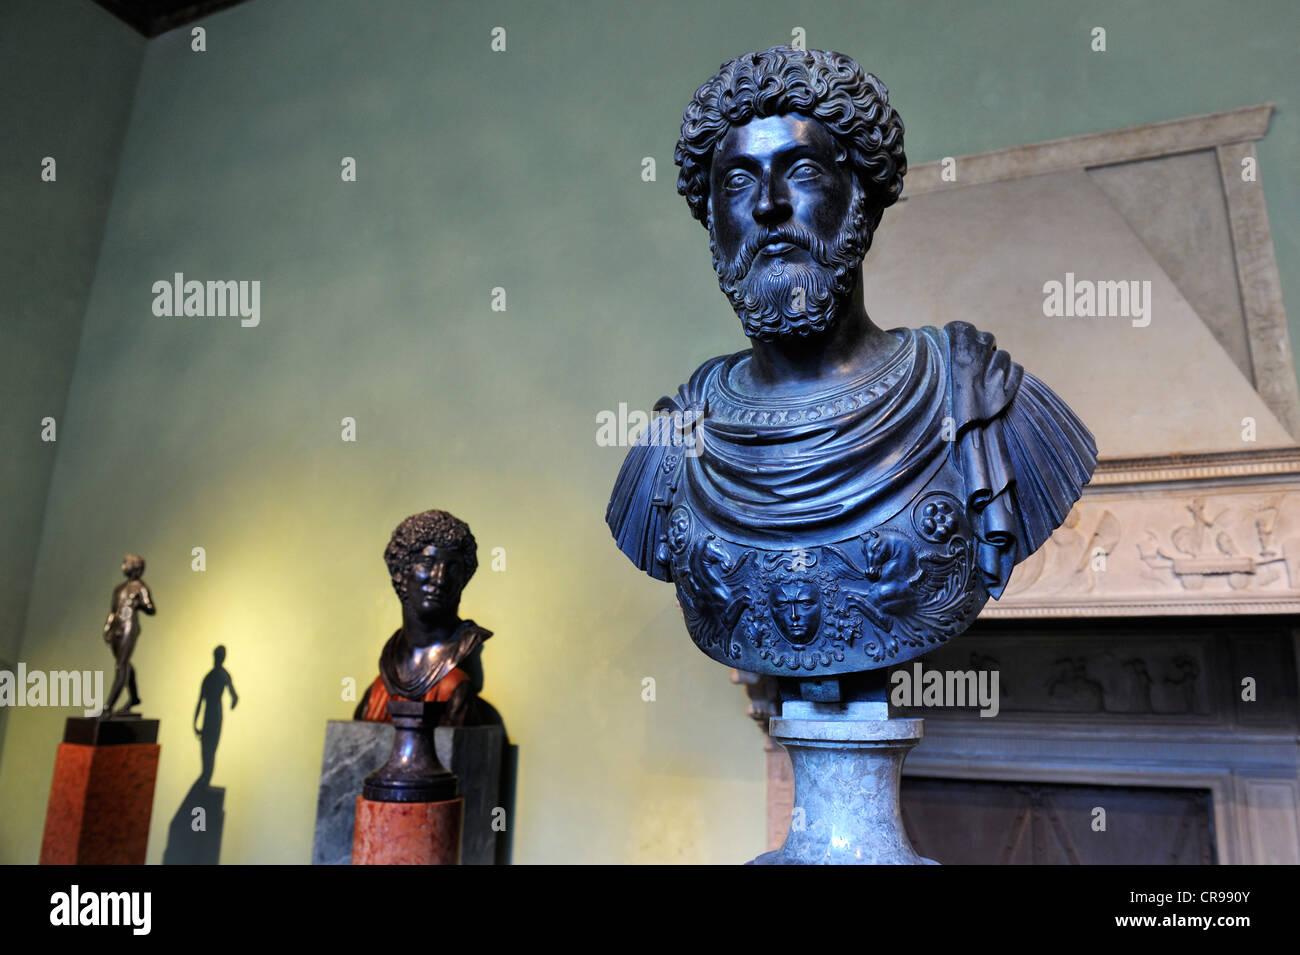 Italian Renaissance busts, Bavarian National Museum, Prinzregentenstrasse 3, Munich, Bavaria, Germany, Europe - Stock Image